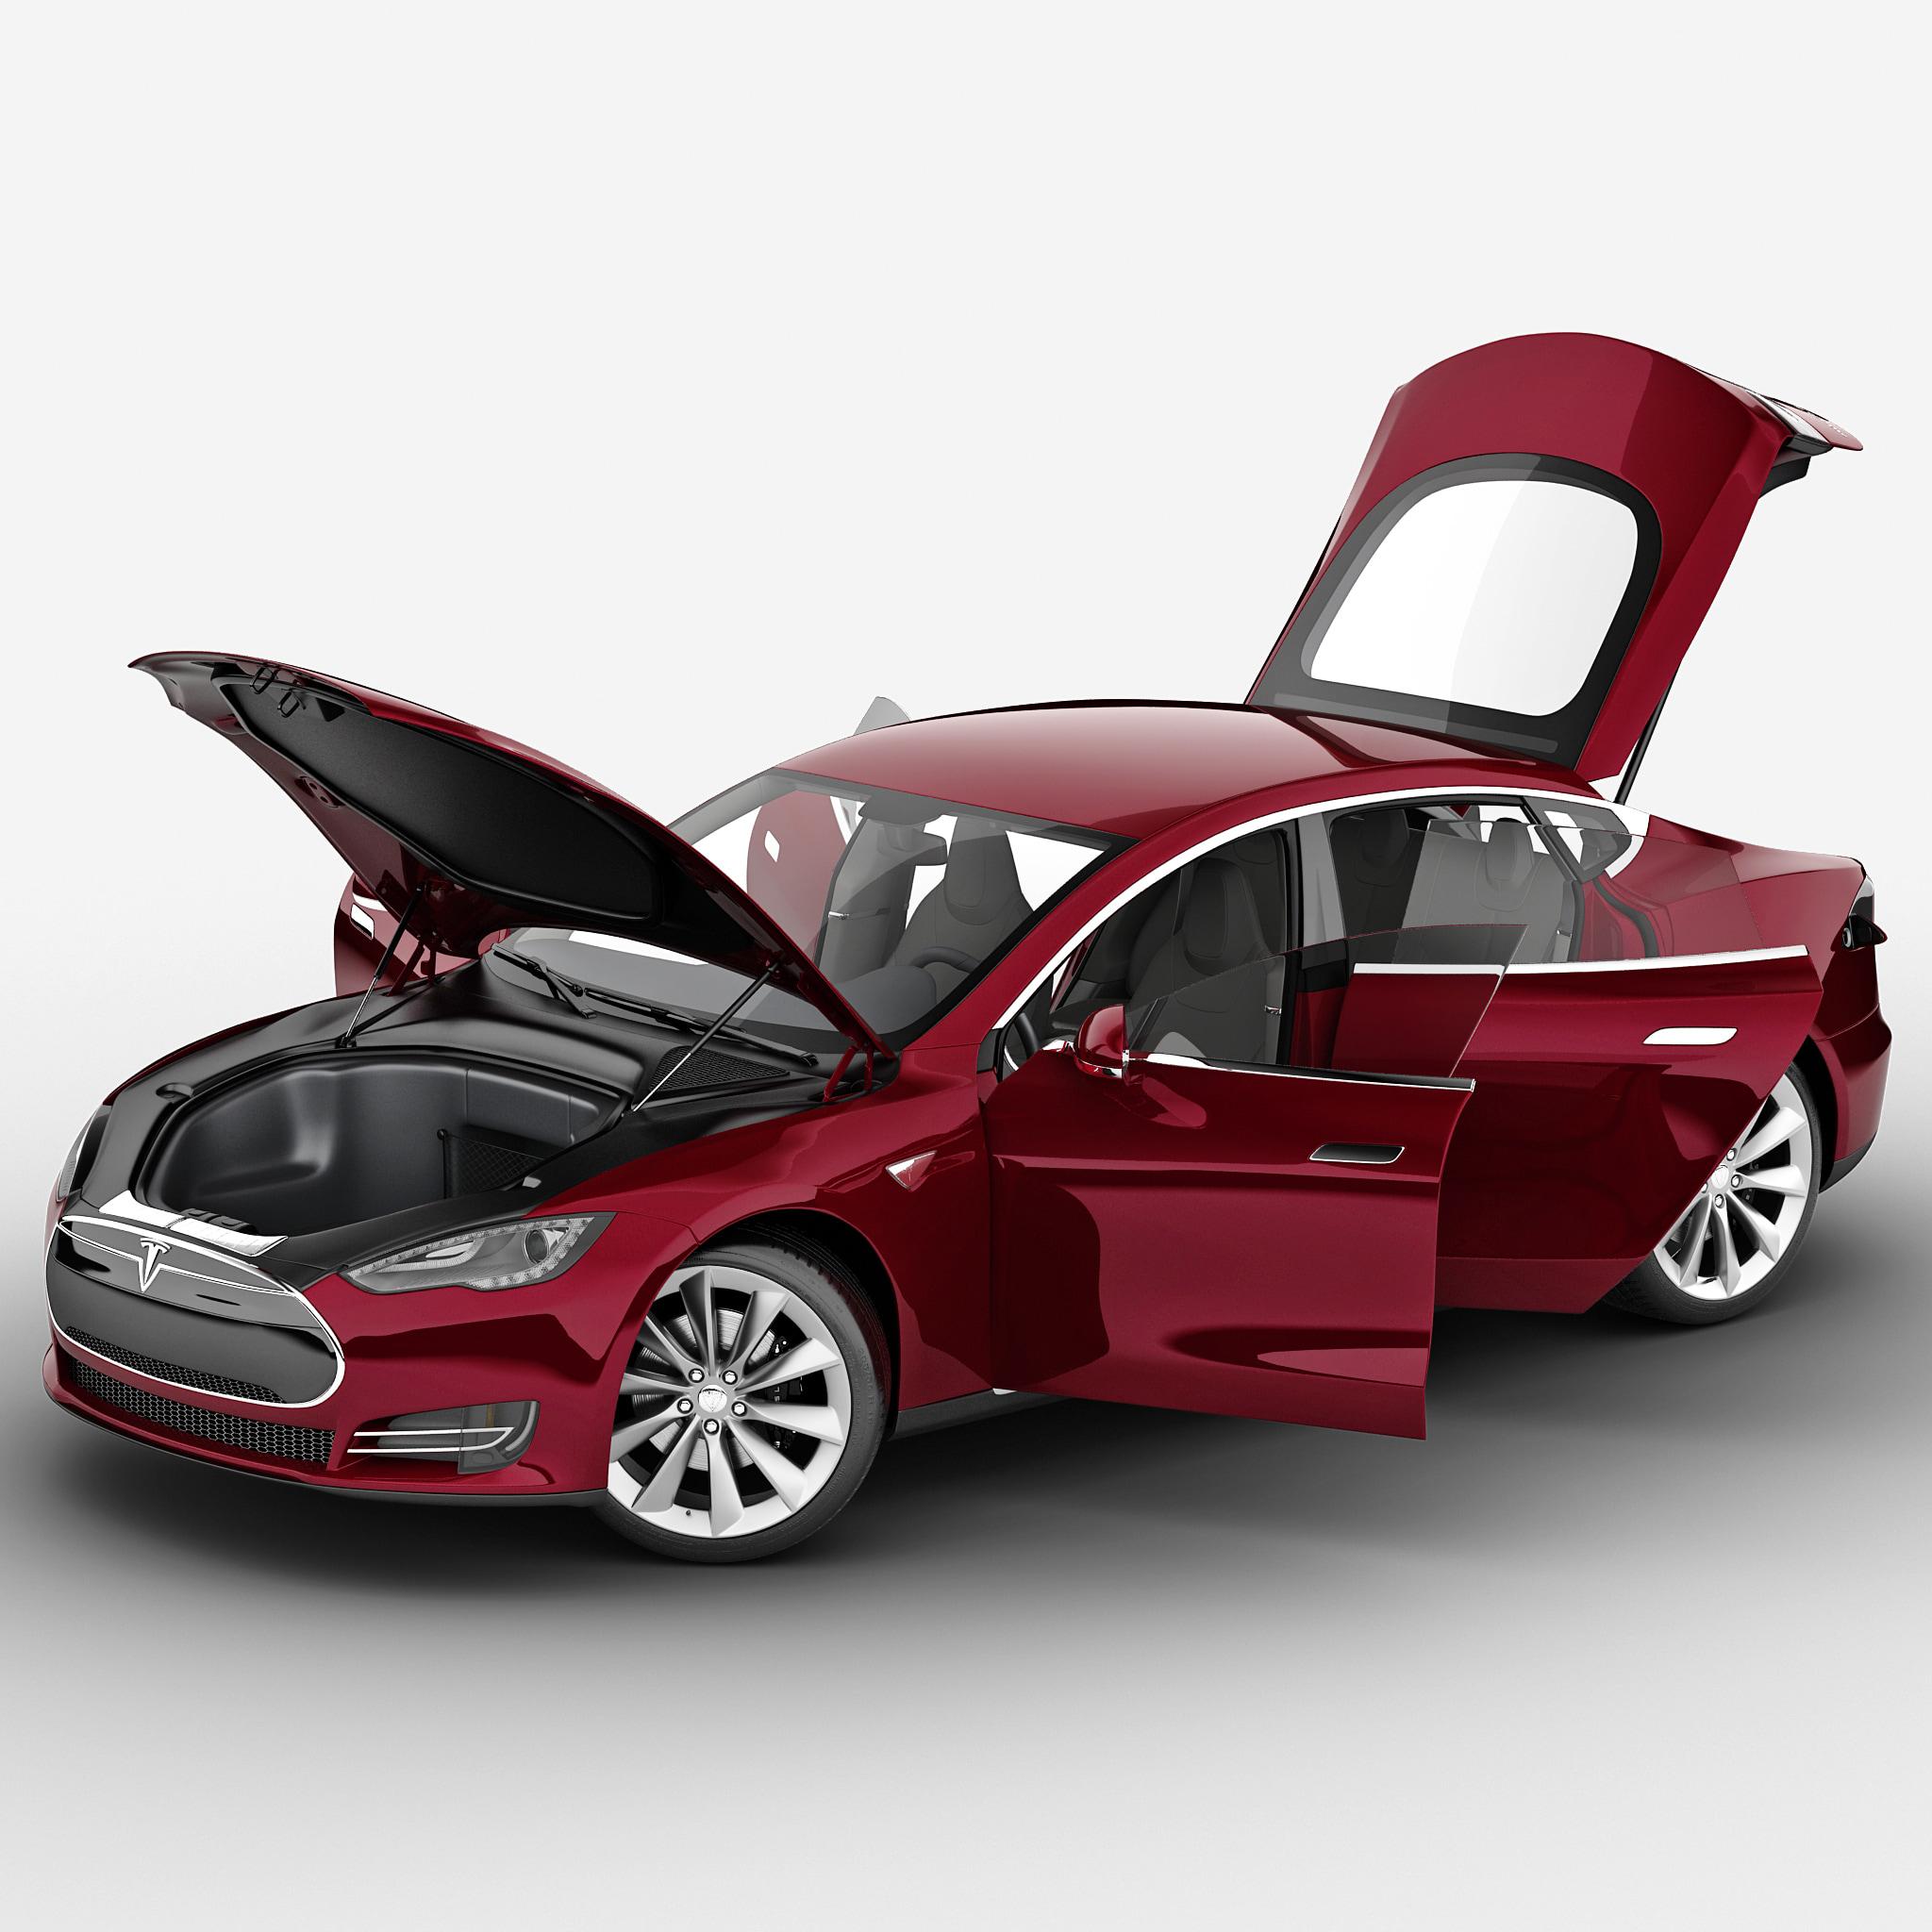 Tesla Model S 2014 Rigged_31.jpg